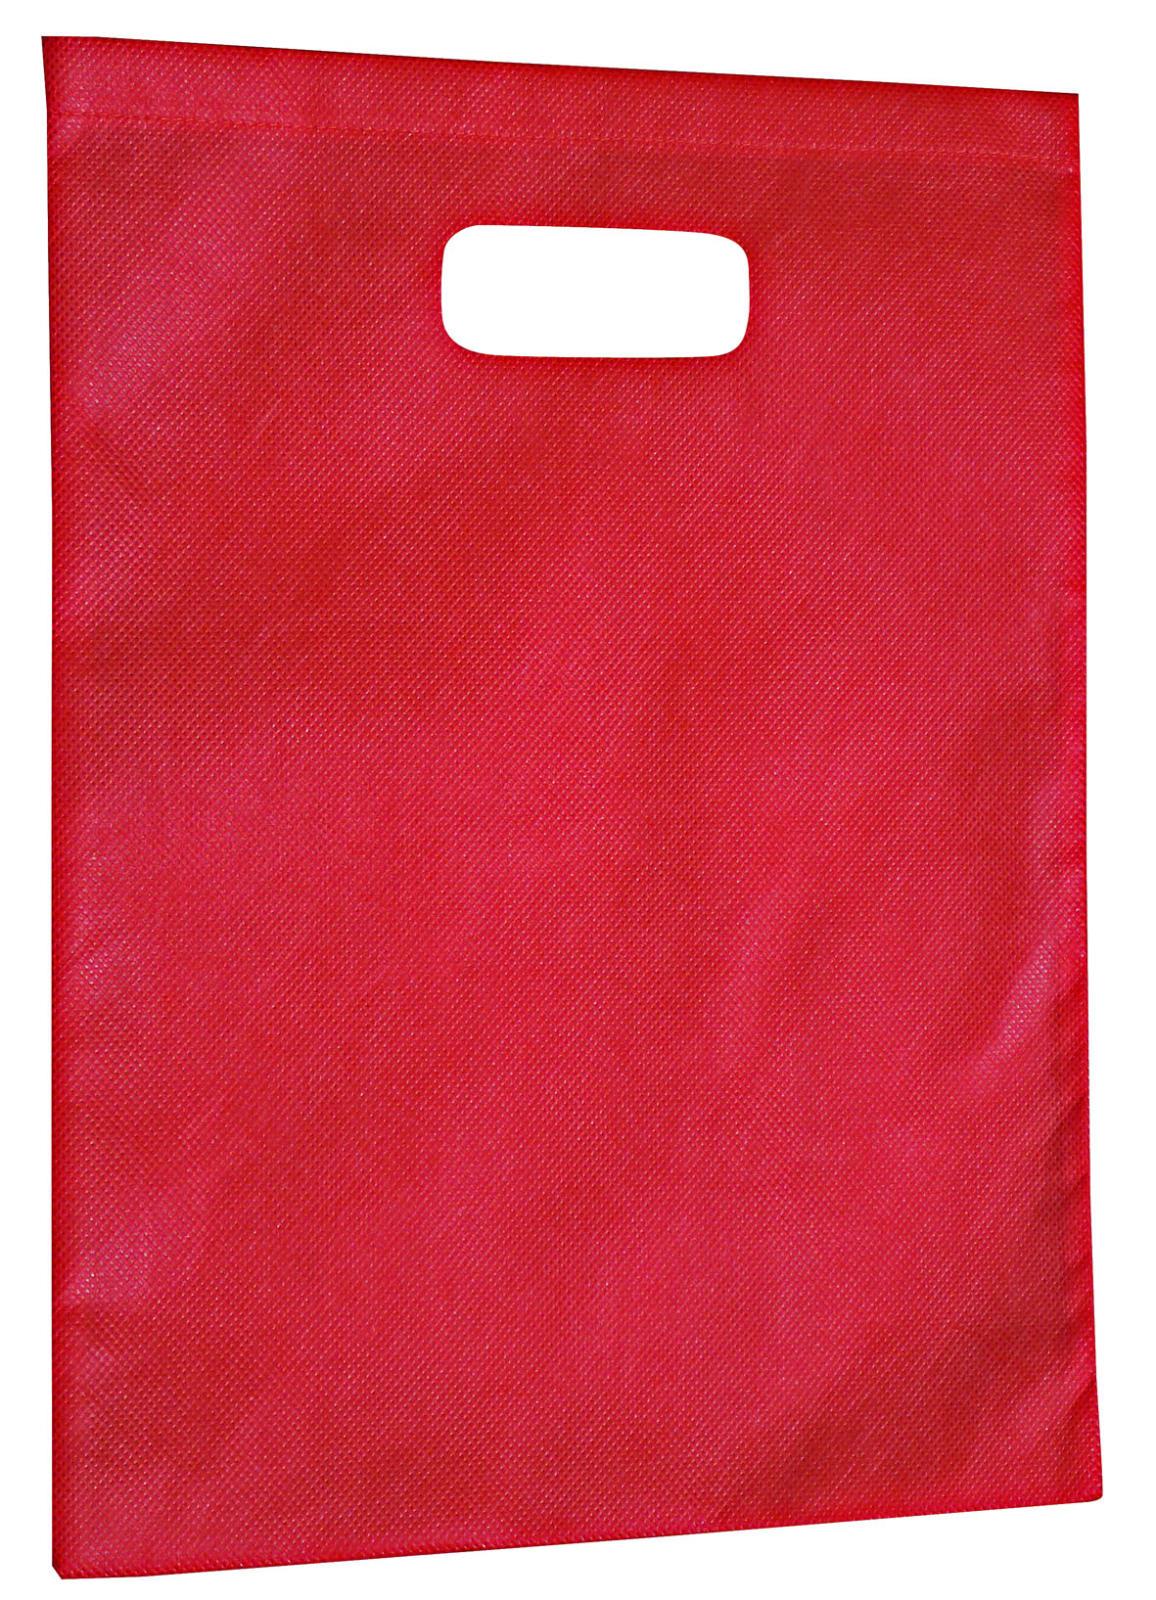 Non-Woven Gift Bag - Large